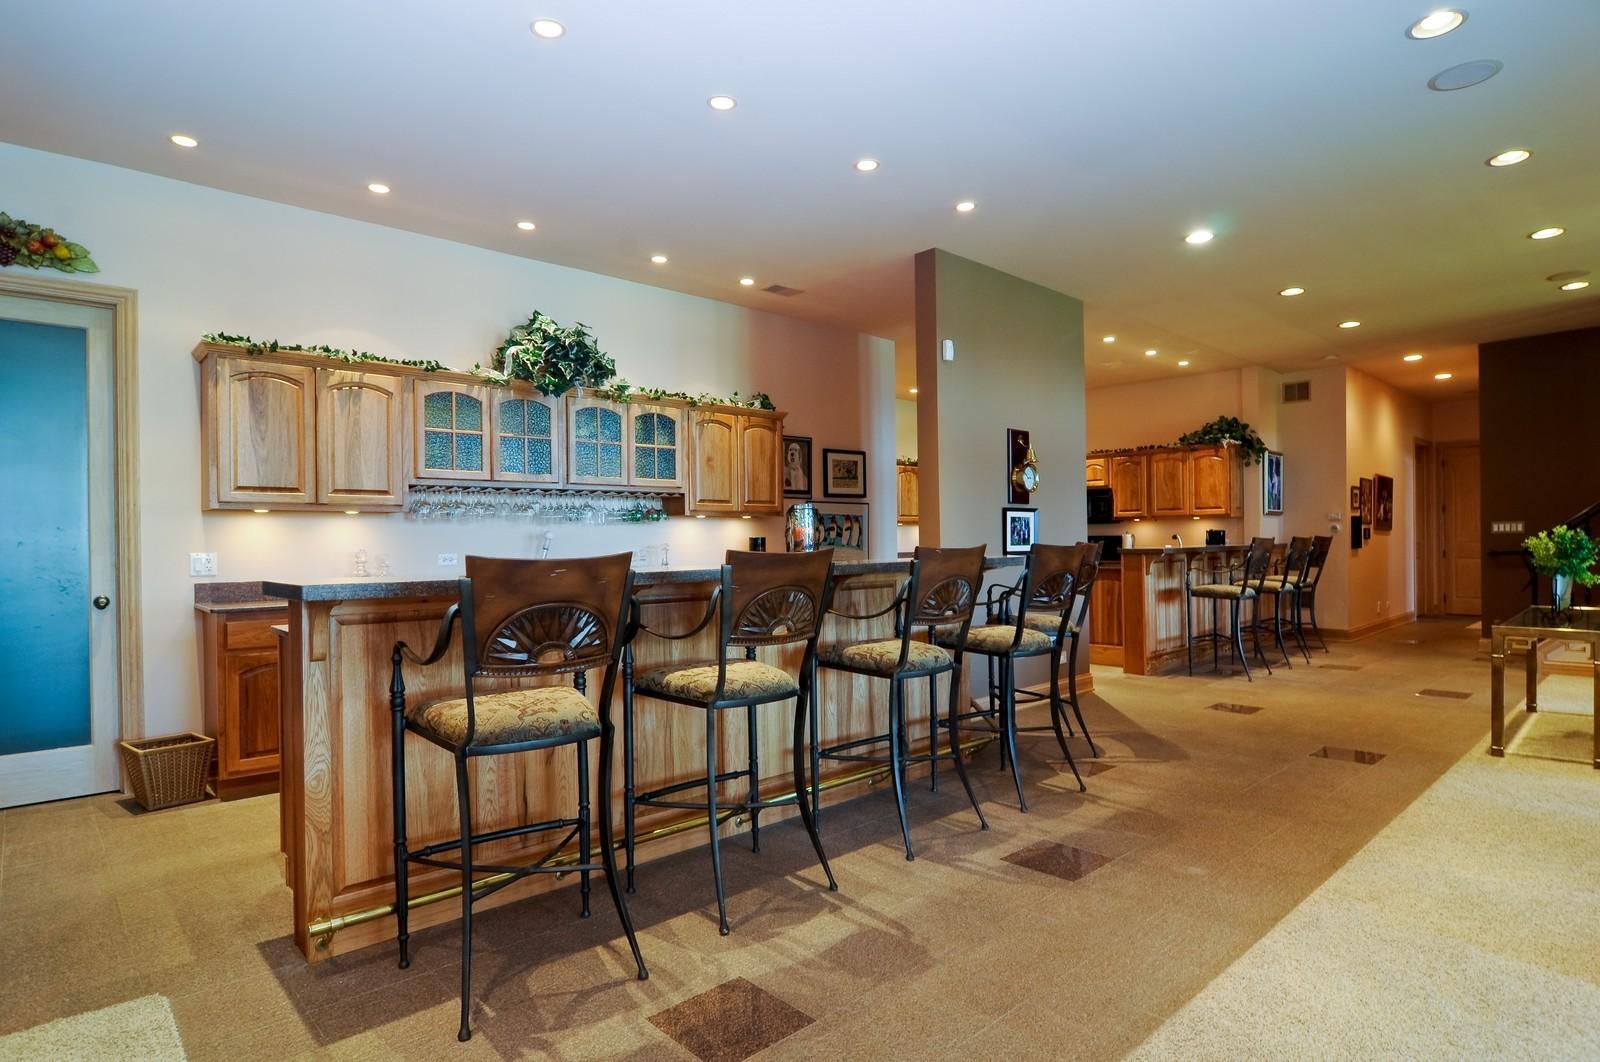 Real Estate Photography - 49 Brittany, Oakwood Hills, IL, 60013 - Basement